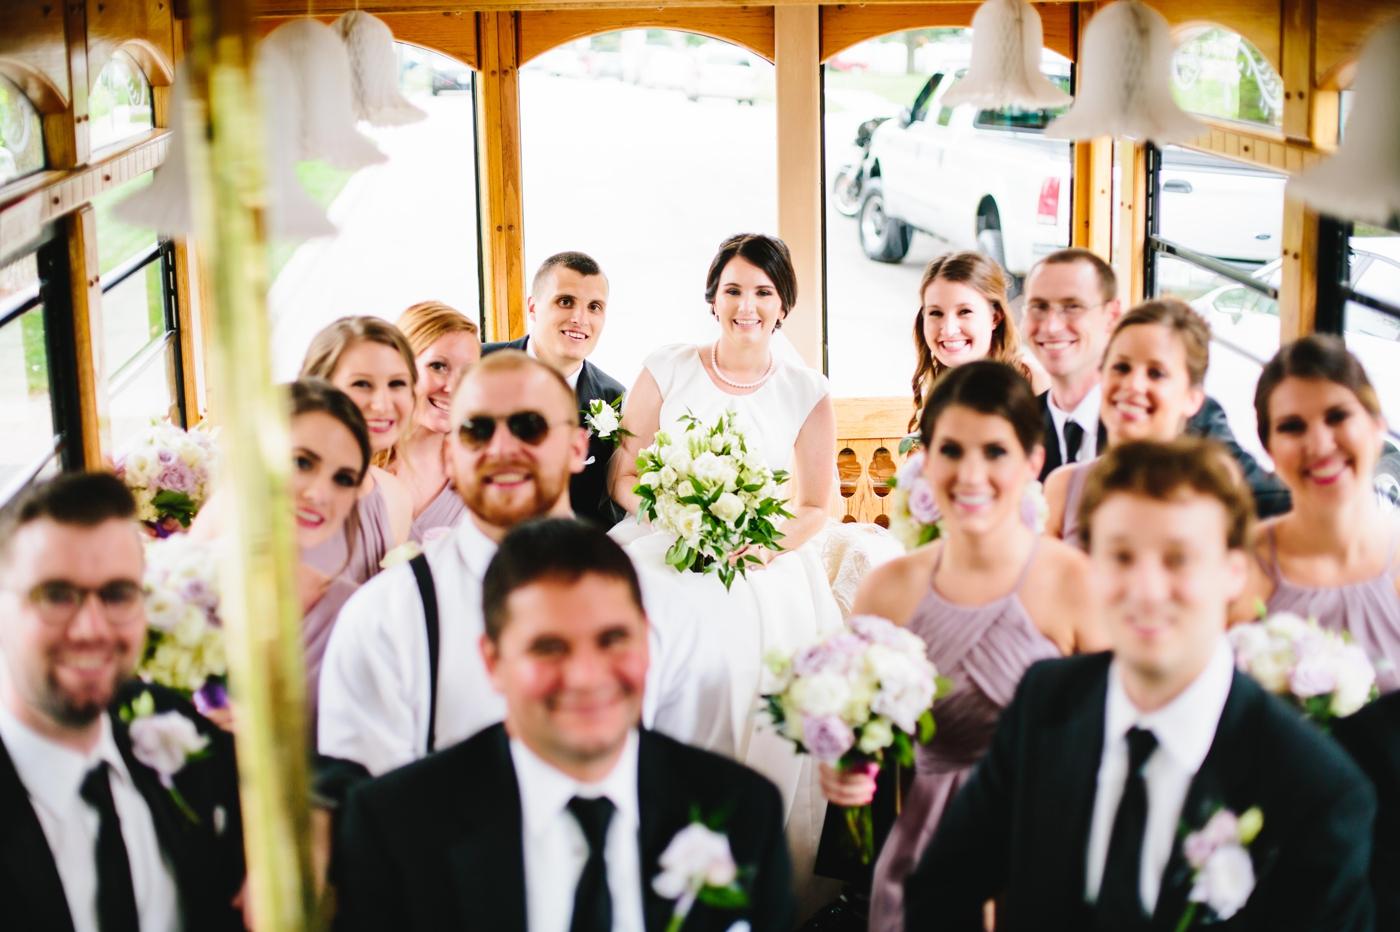 chicago-fine-art-wedding-photography-mccarthy19